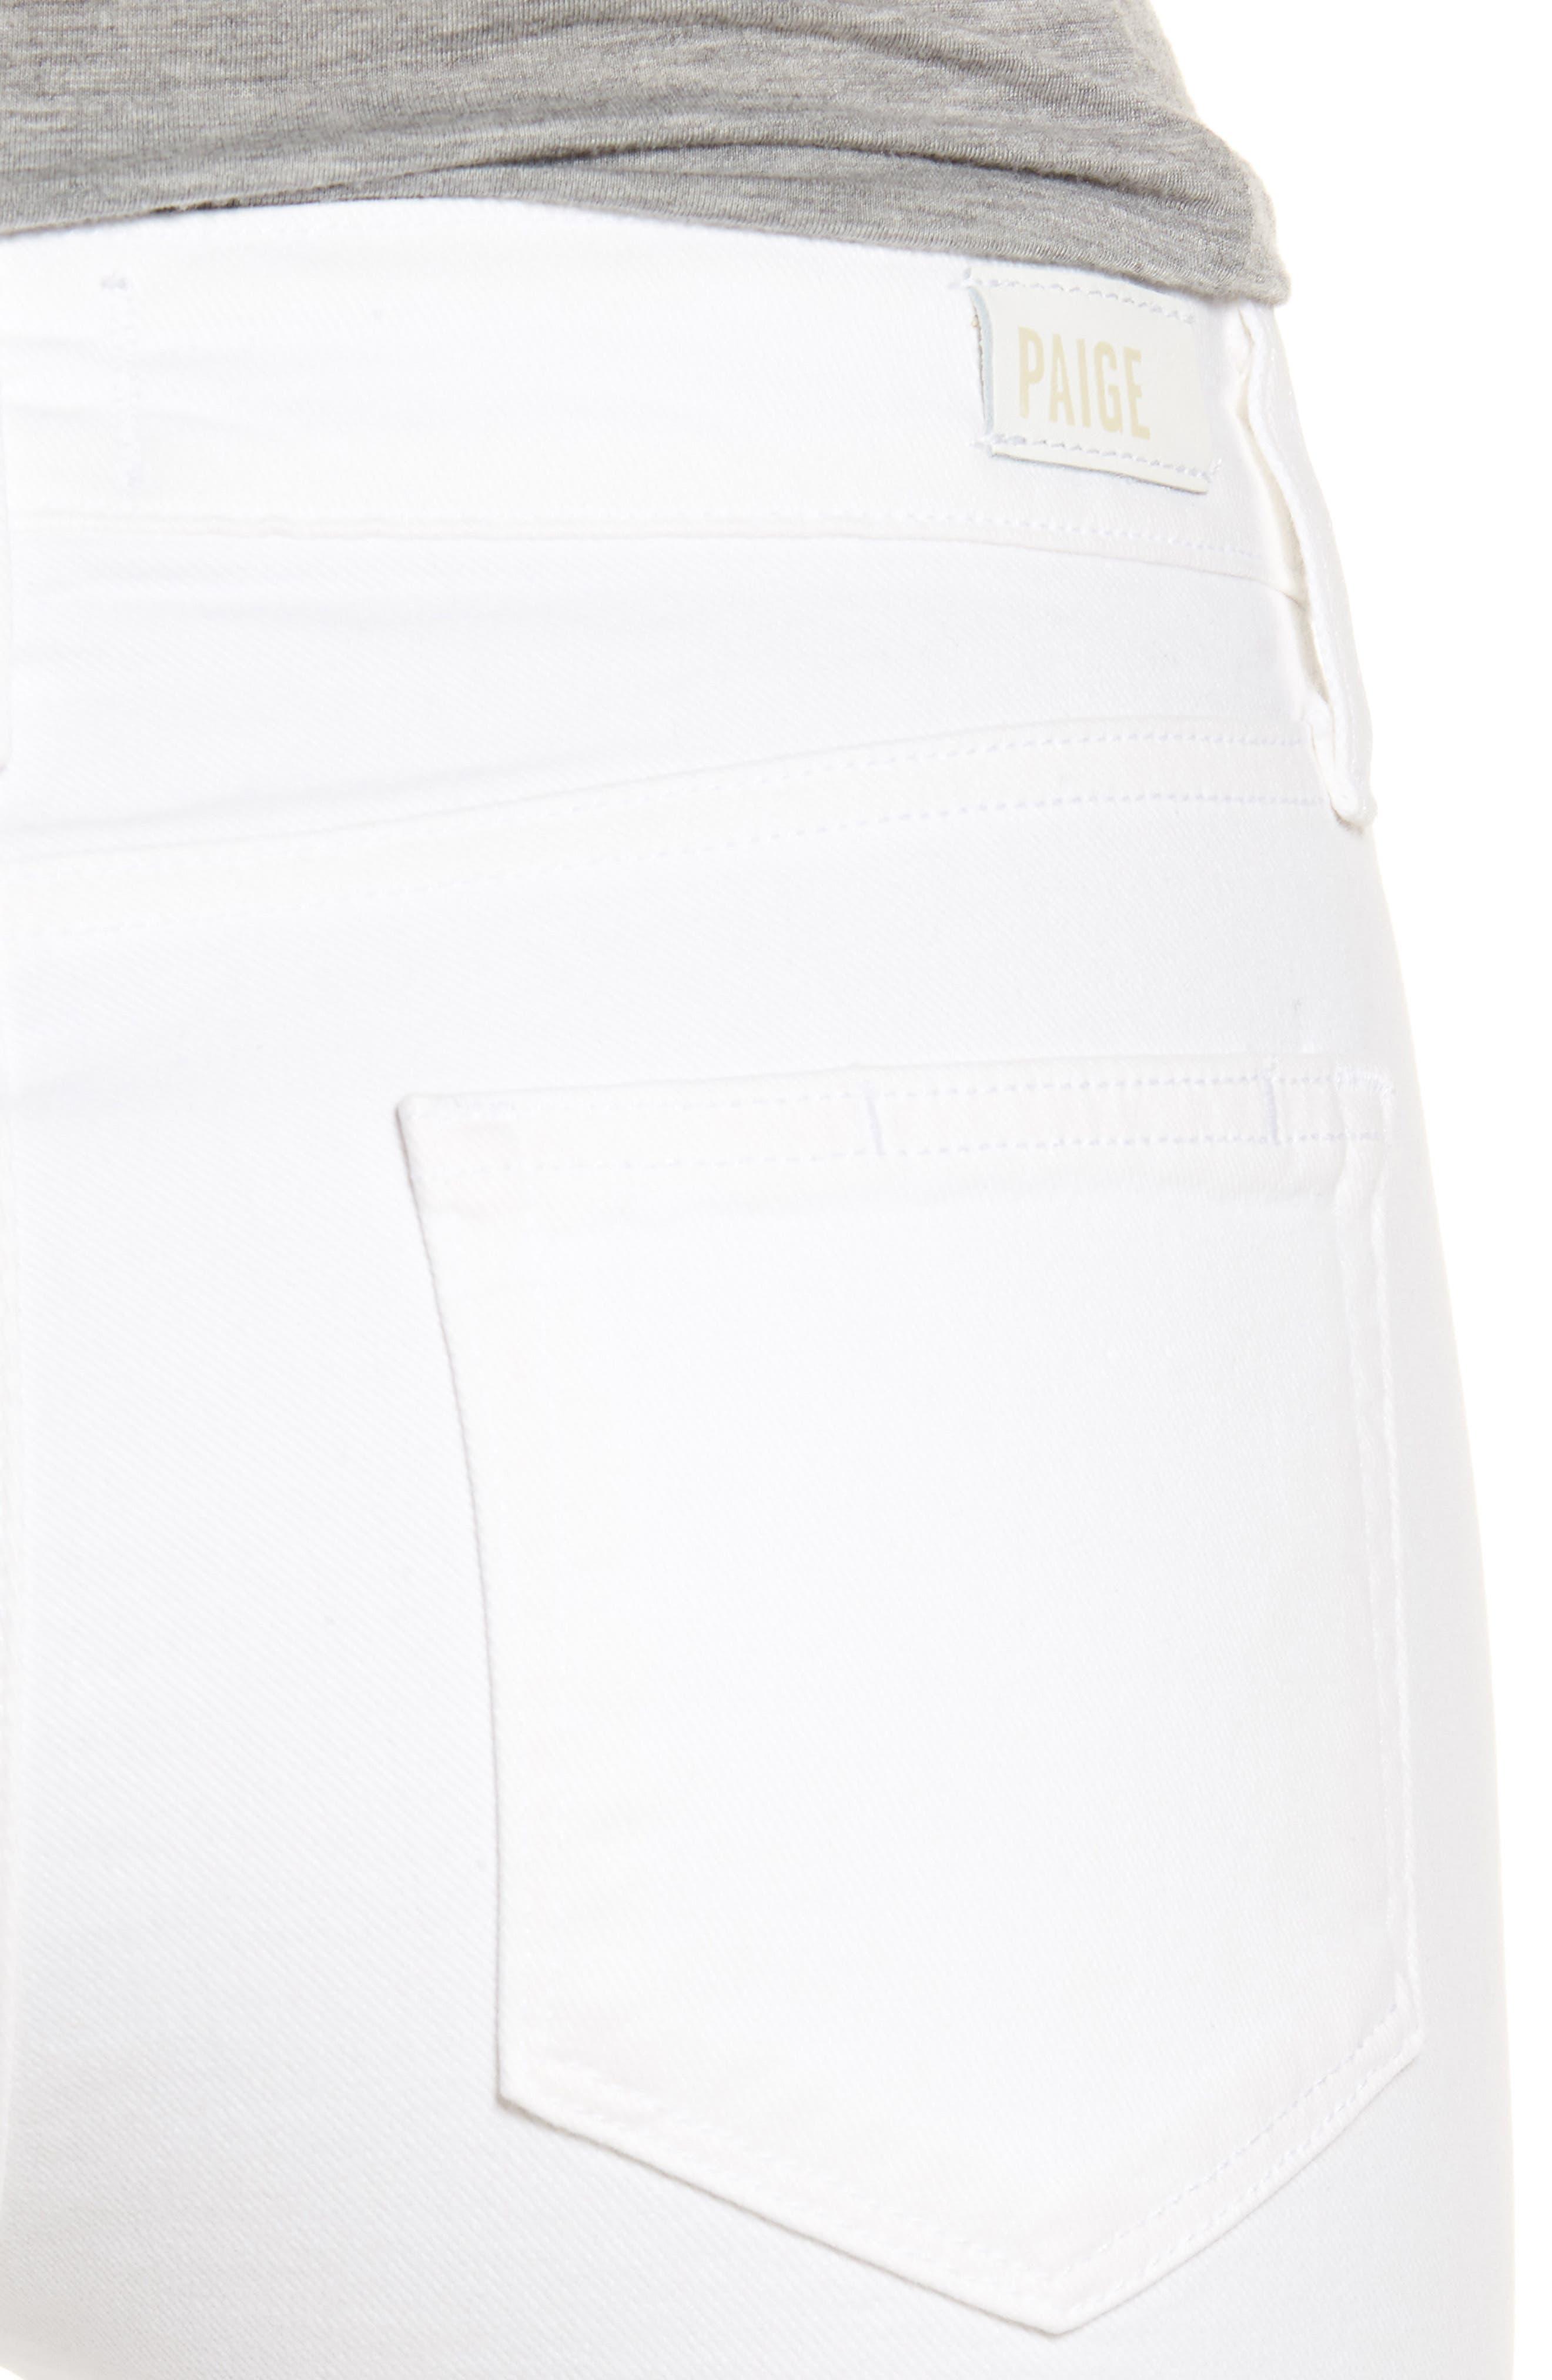 PAIGE, 'Skyline' Ankle Peg Skinny Jeans, Alternate thumbnail 5, color, 100